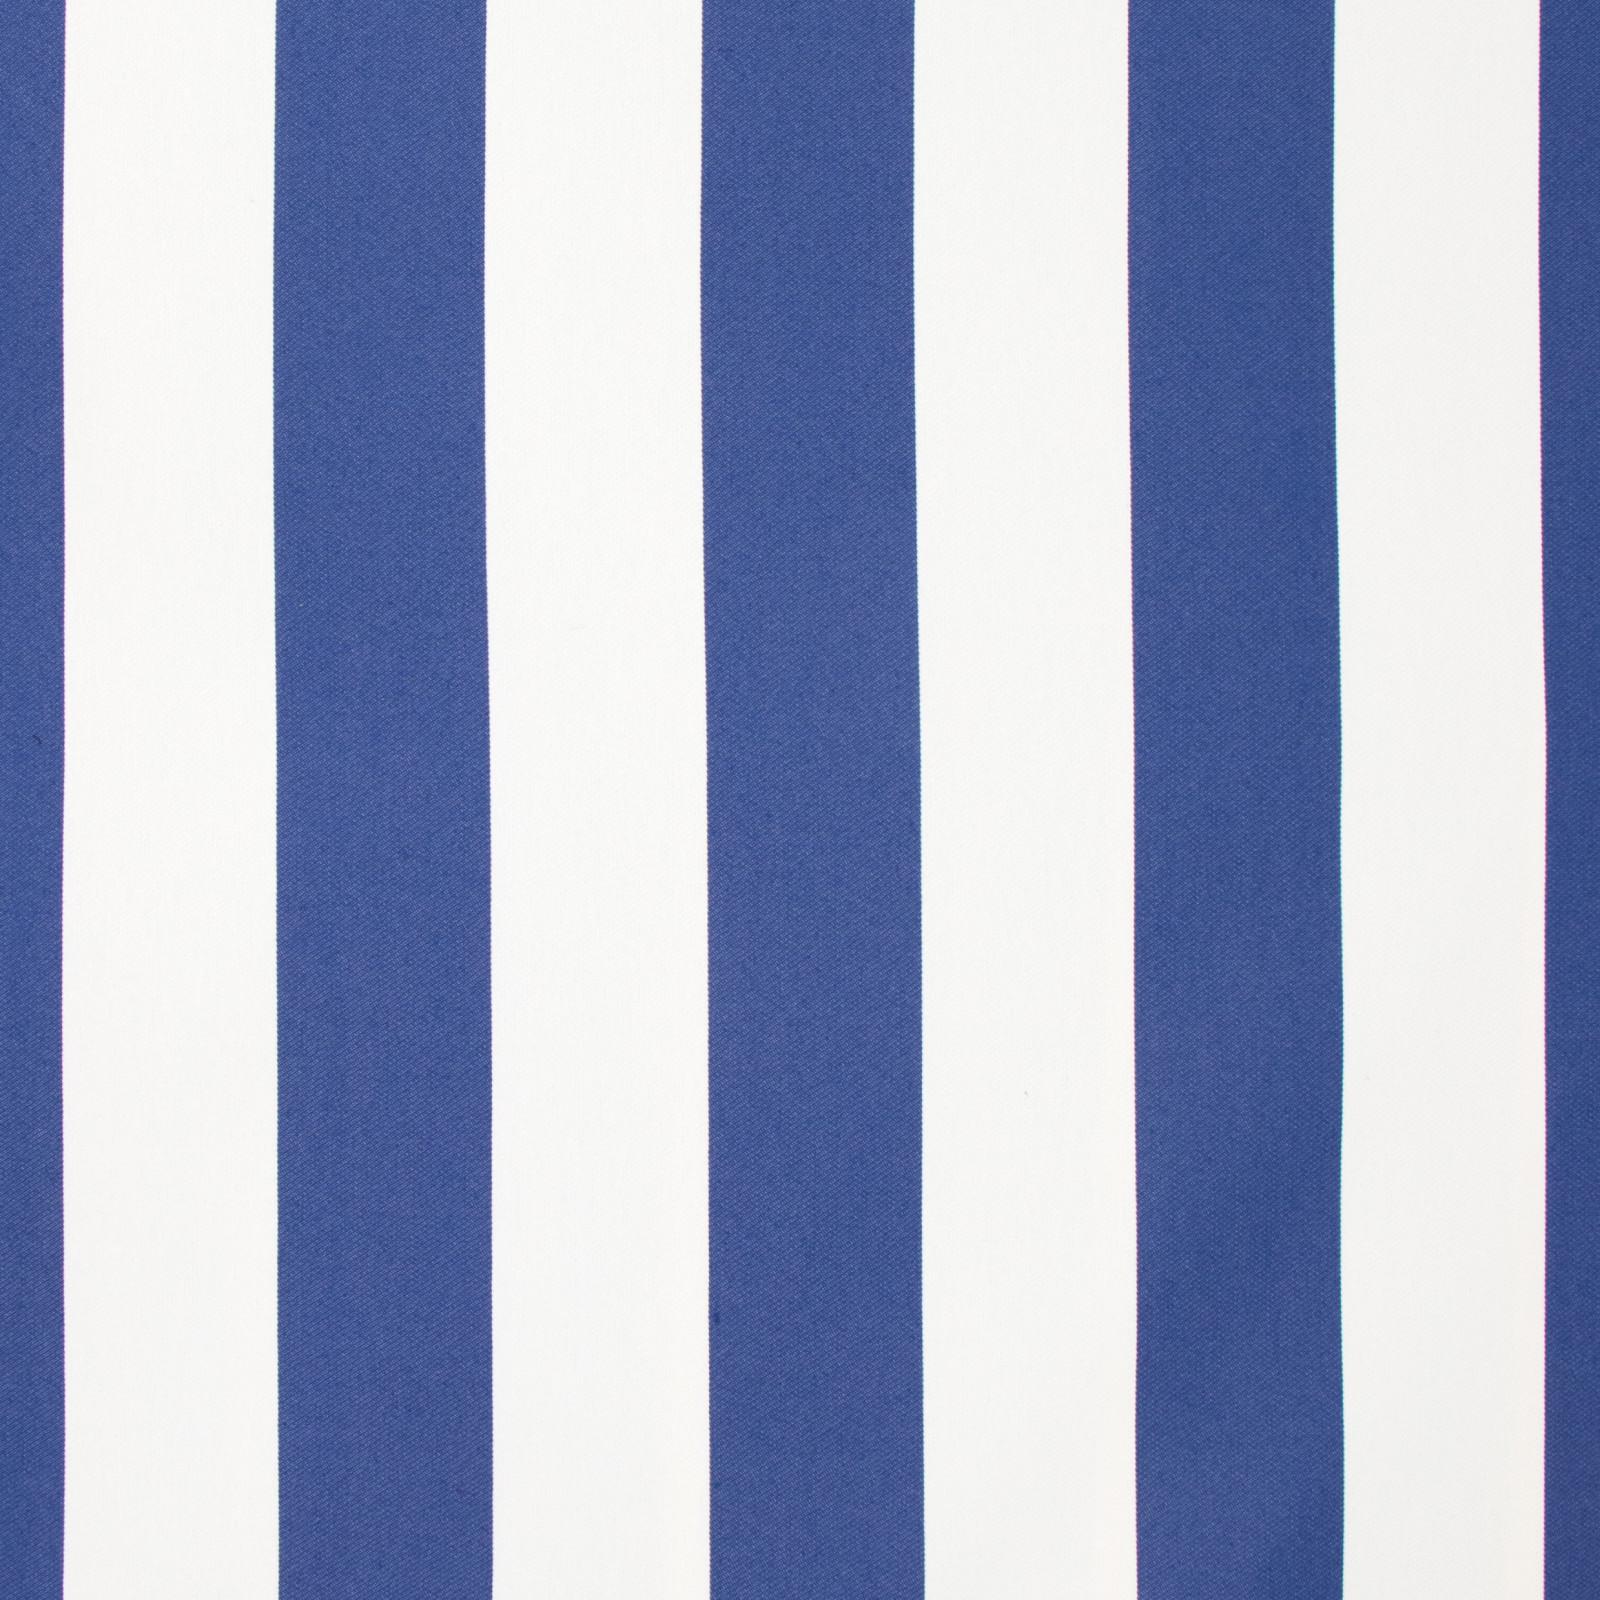 B8811 Royal Blue Greenhouse Fabrics